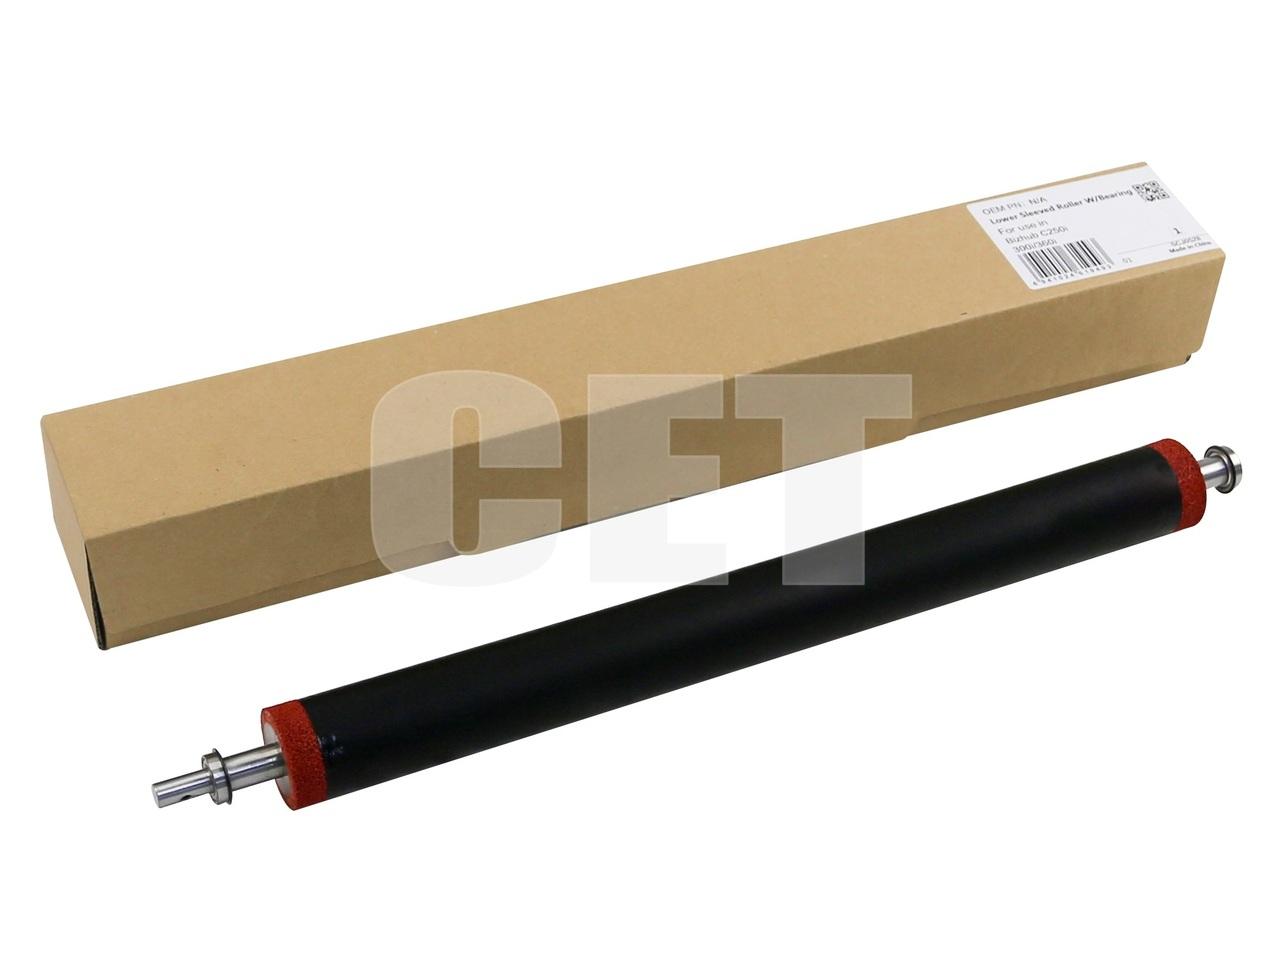 Резиновый вал с подшипниками AA2JR70300-LSR,AA2JR70400-LSR для KONICA MINOLTA Bizhub C250i/300i/360i(CET), CET211022